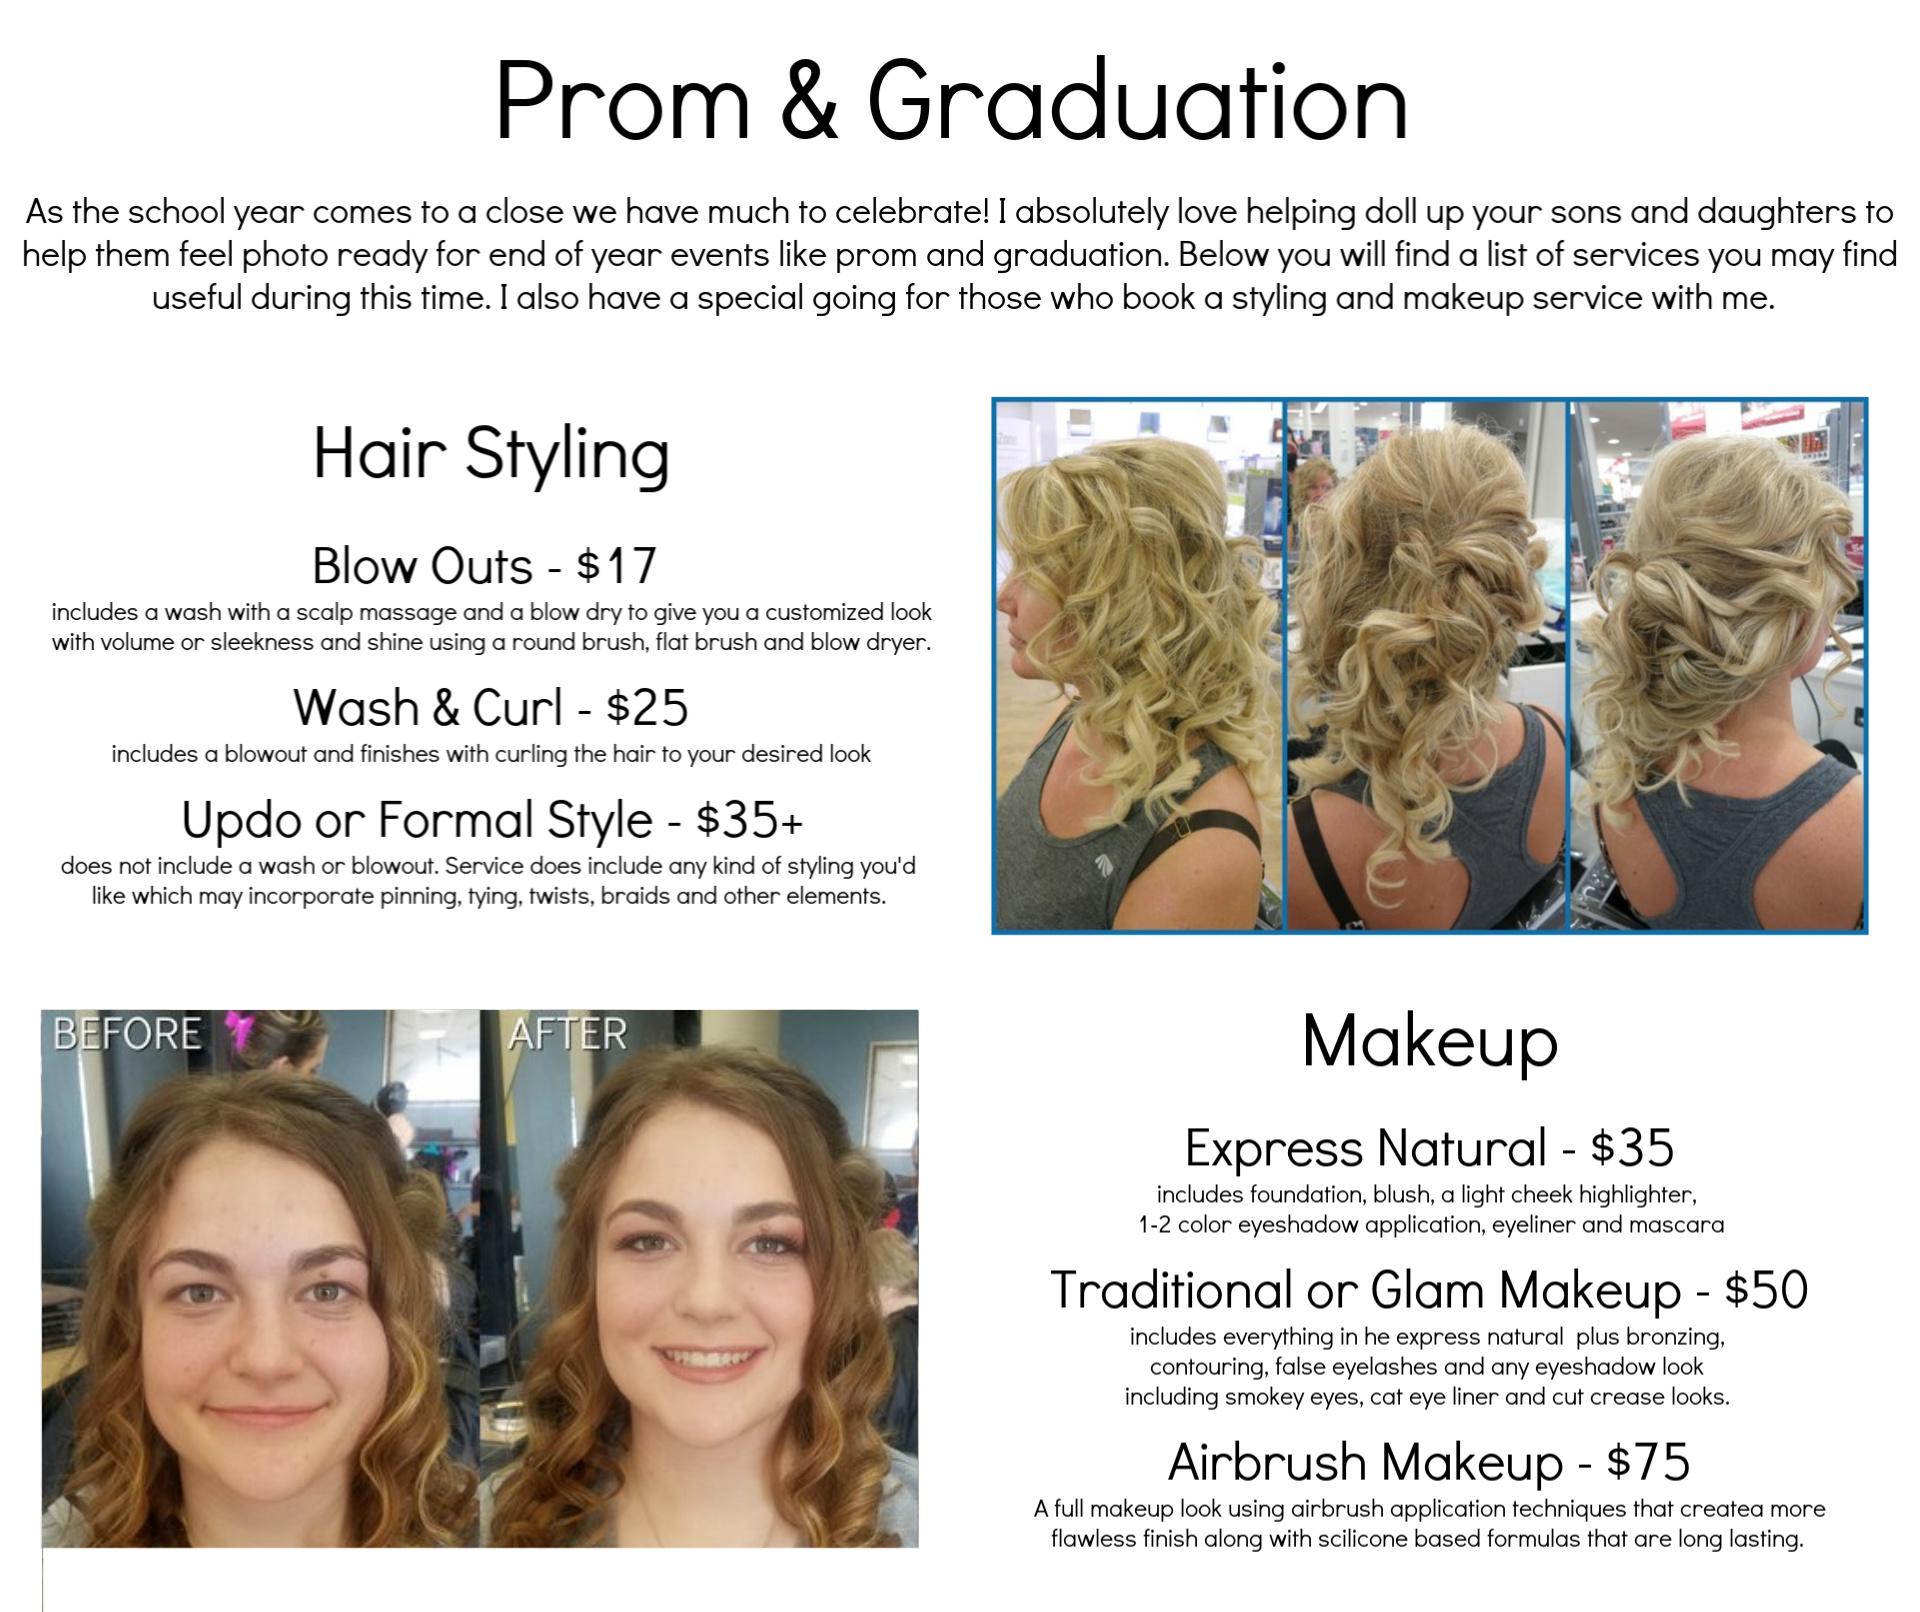 prom and graduation.jpg